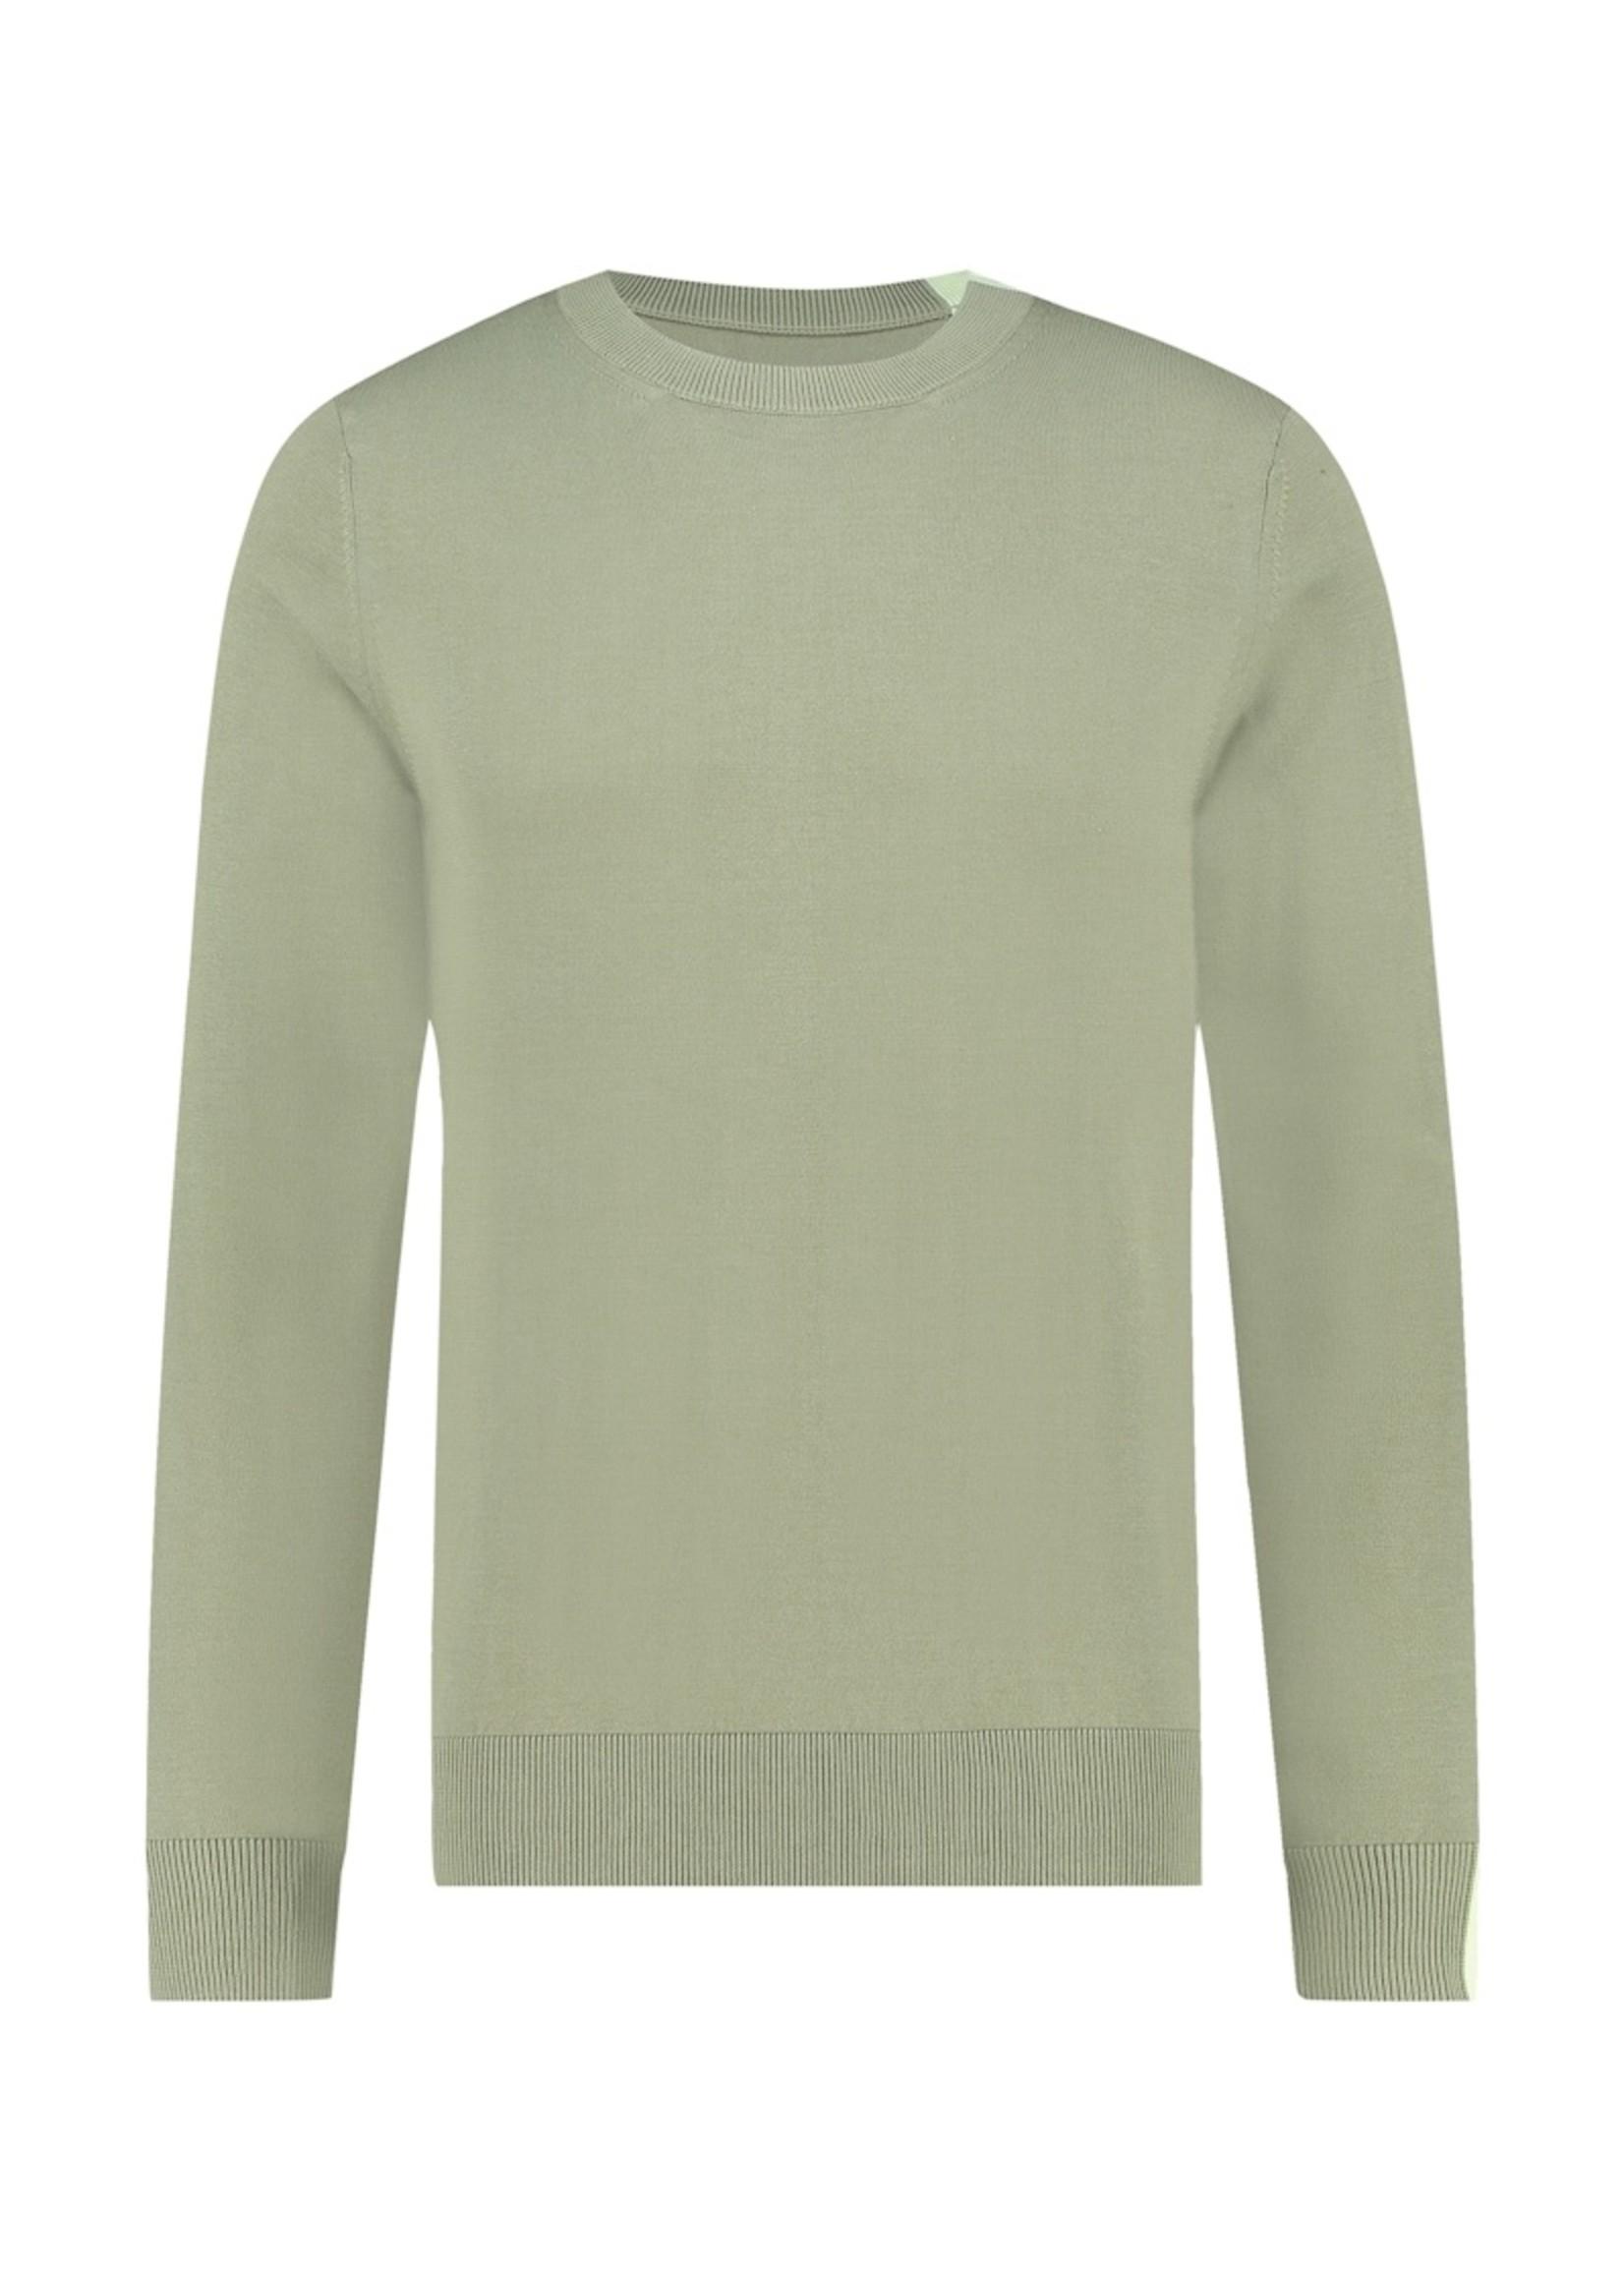 Purewhite Knitted Raglan Sweater - Light Army